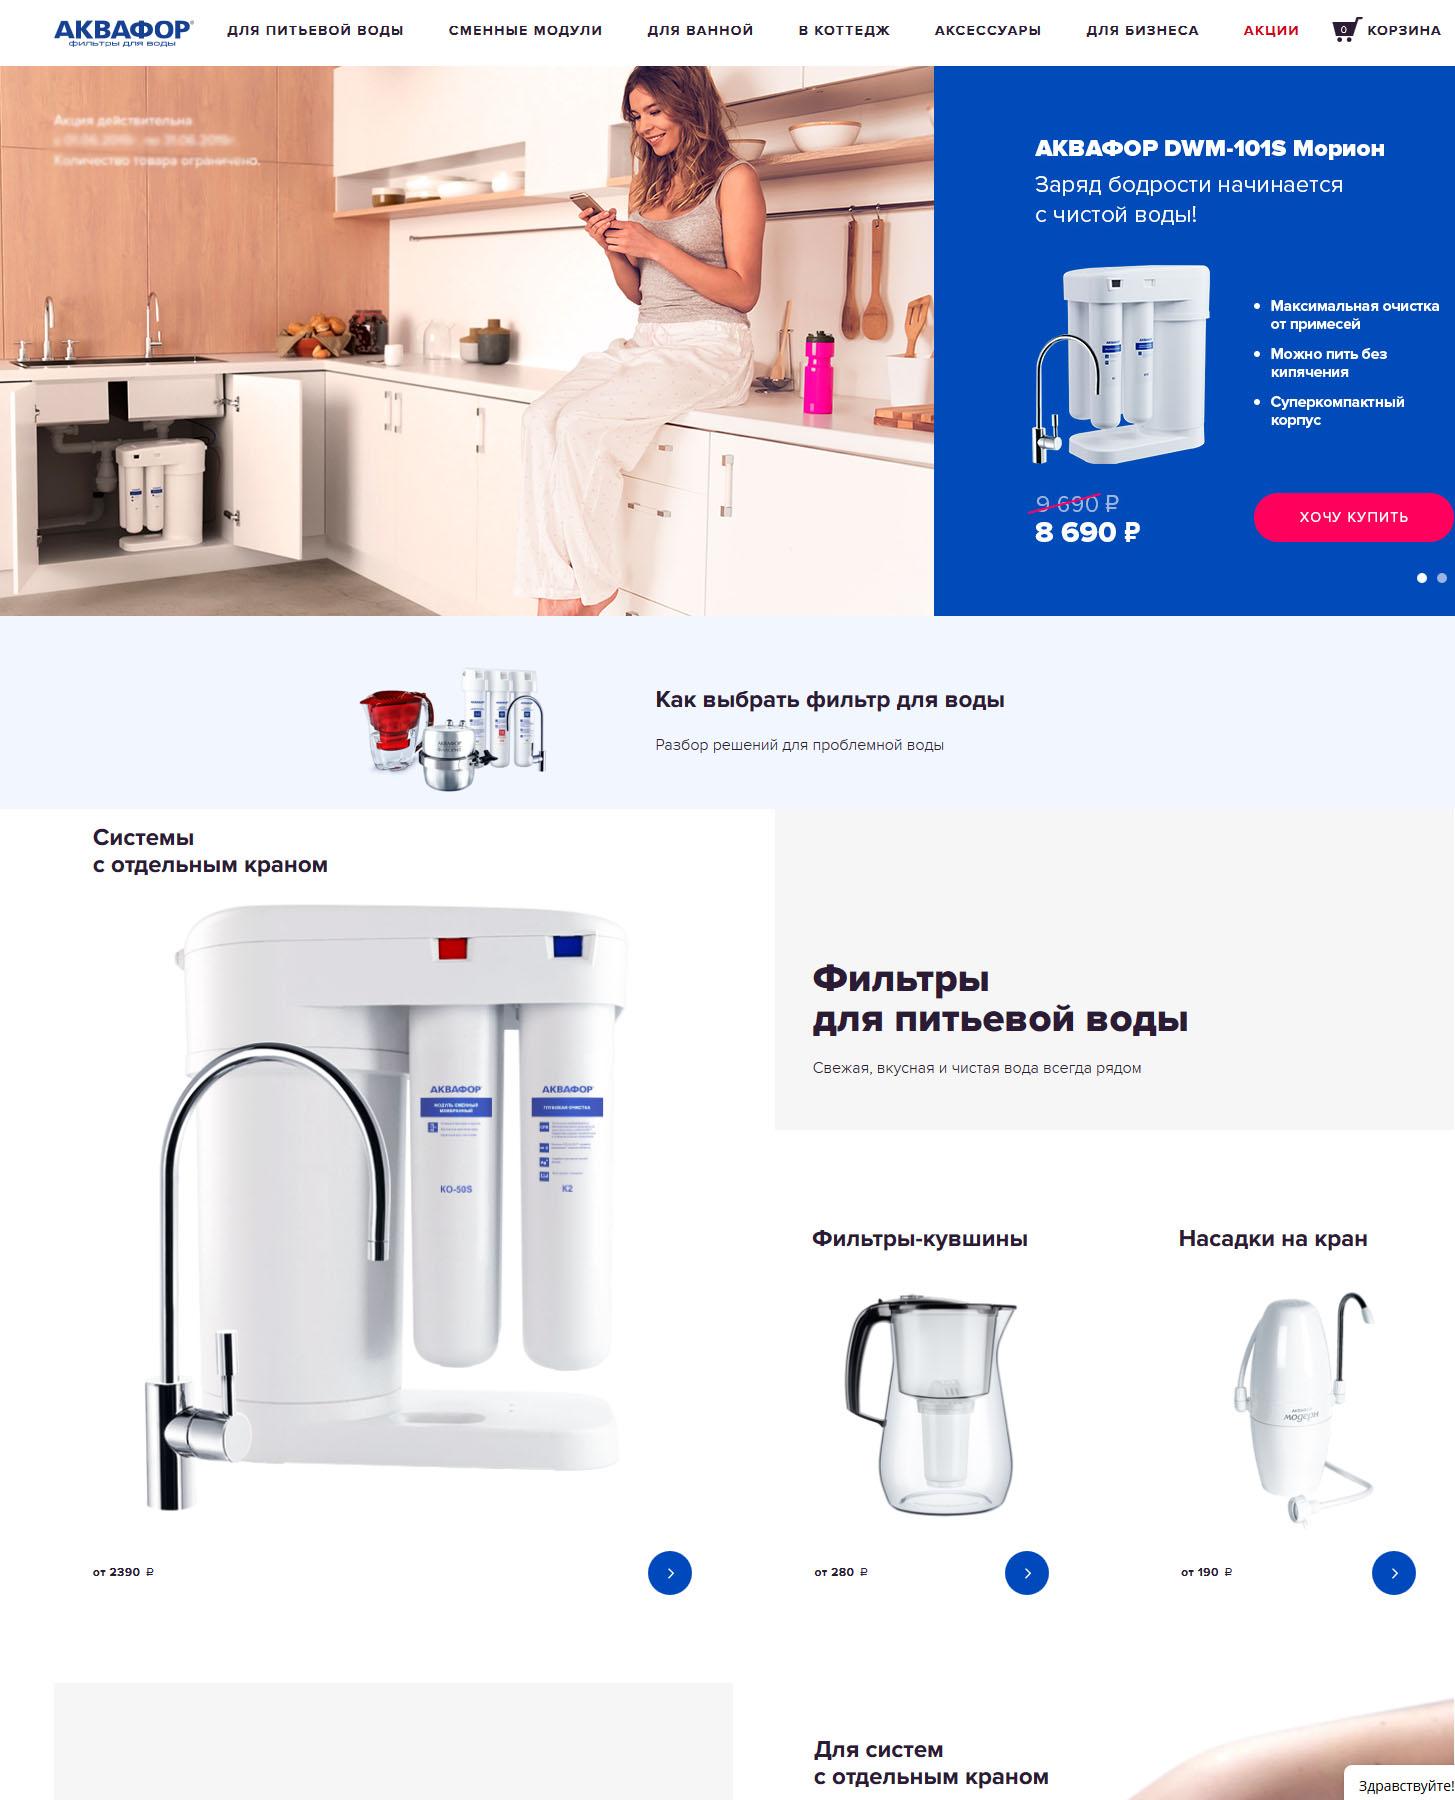 Интернет-магазин Аквафор